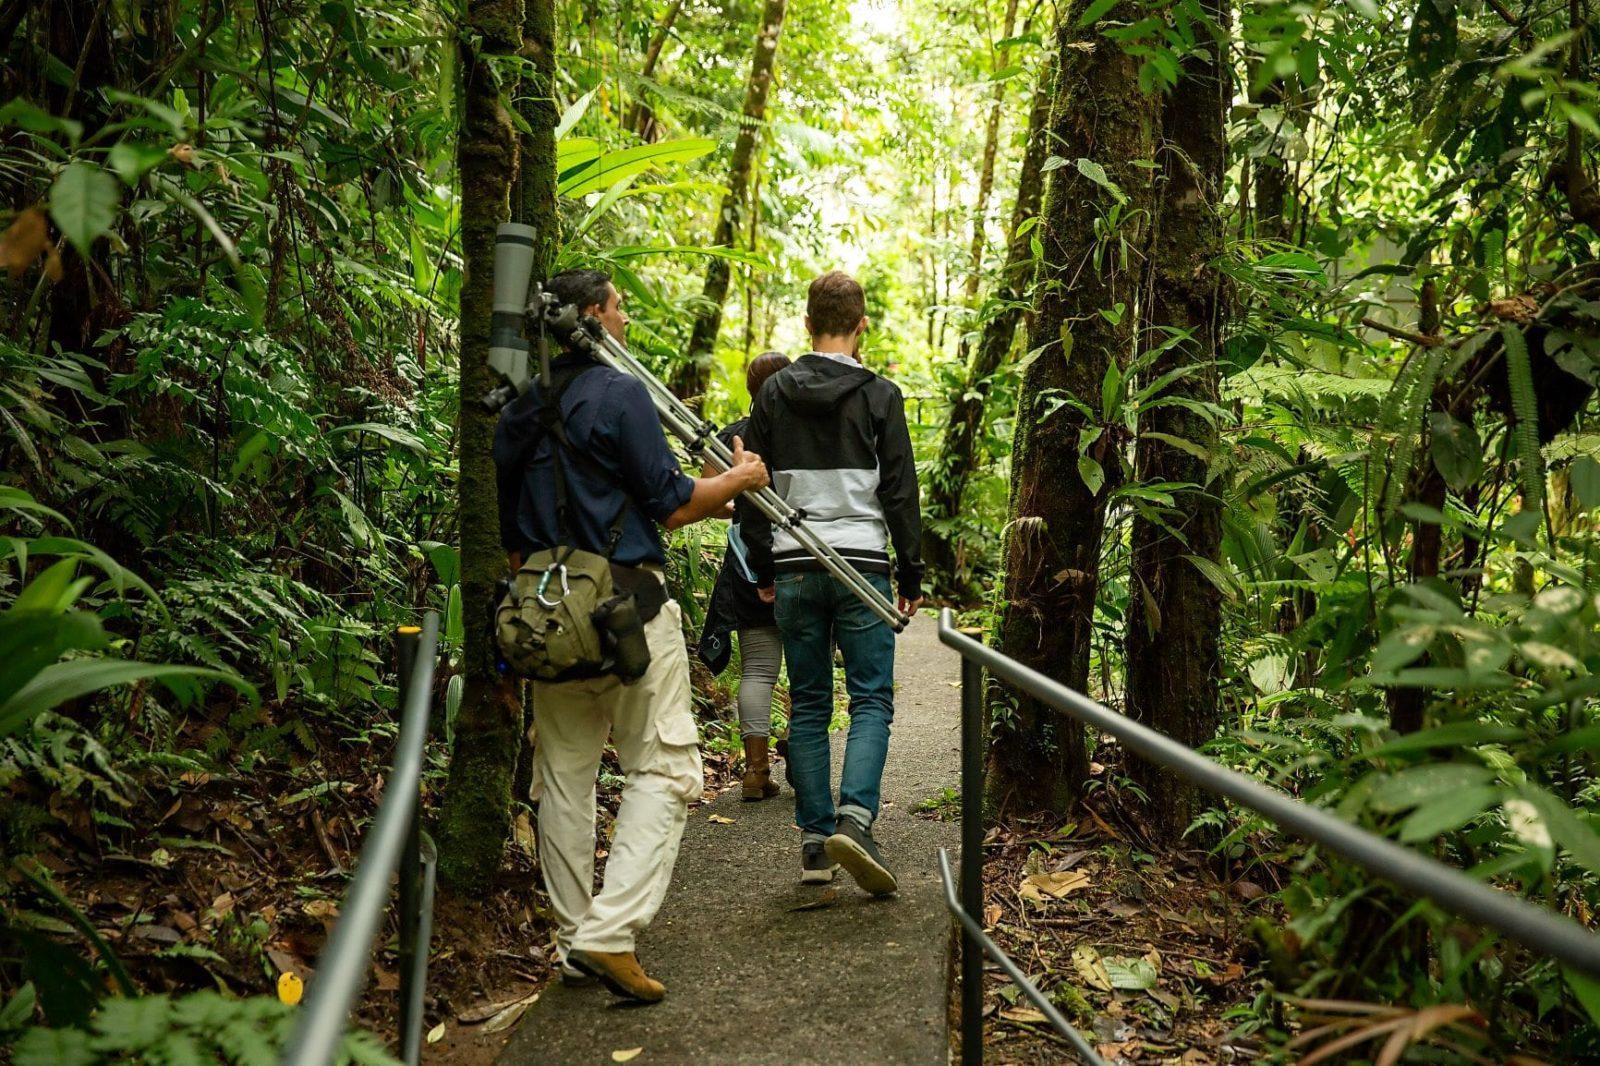 costa-rica-aerial-gda-global-dmc-alliance-rainforest-beyond-travel-incentives-Birdwatching2-min